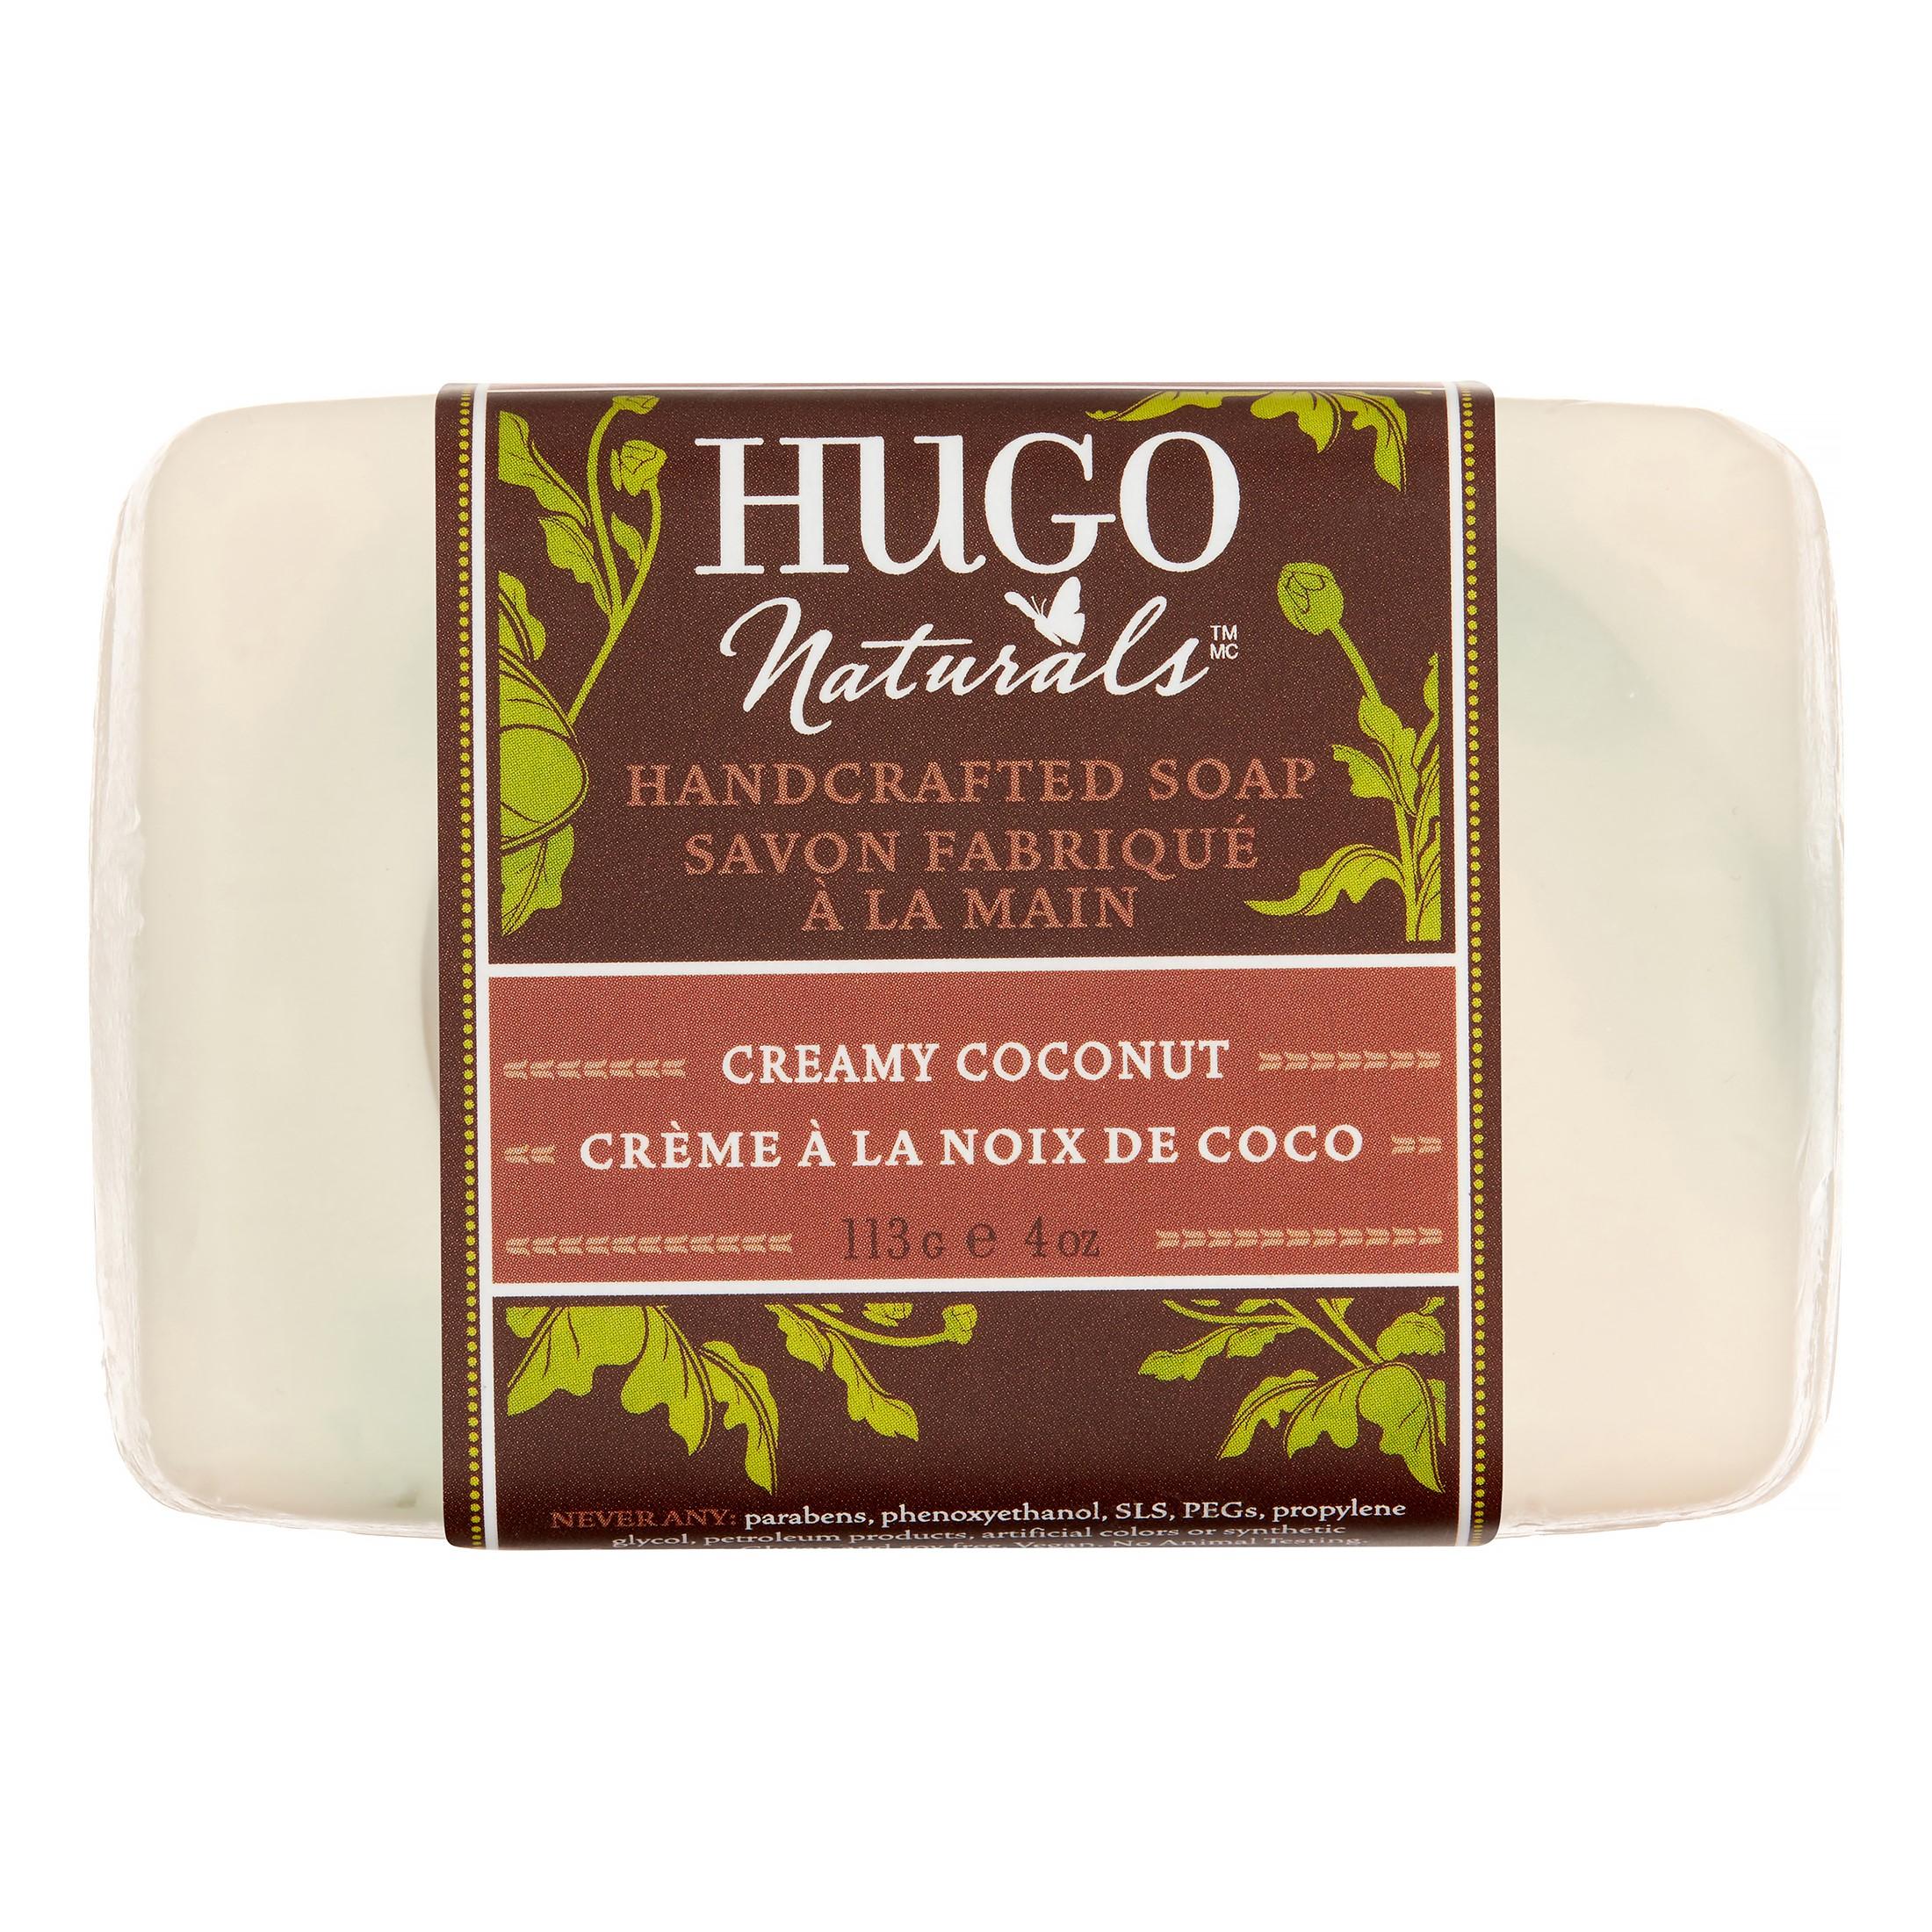 Hugo Naturals Handcrafted Bar Soap, Creamy Coconut, 4 Oz